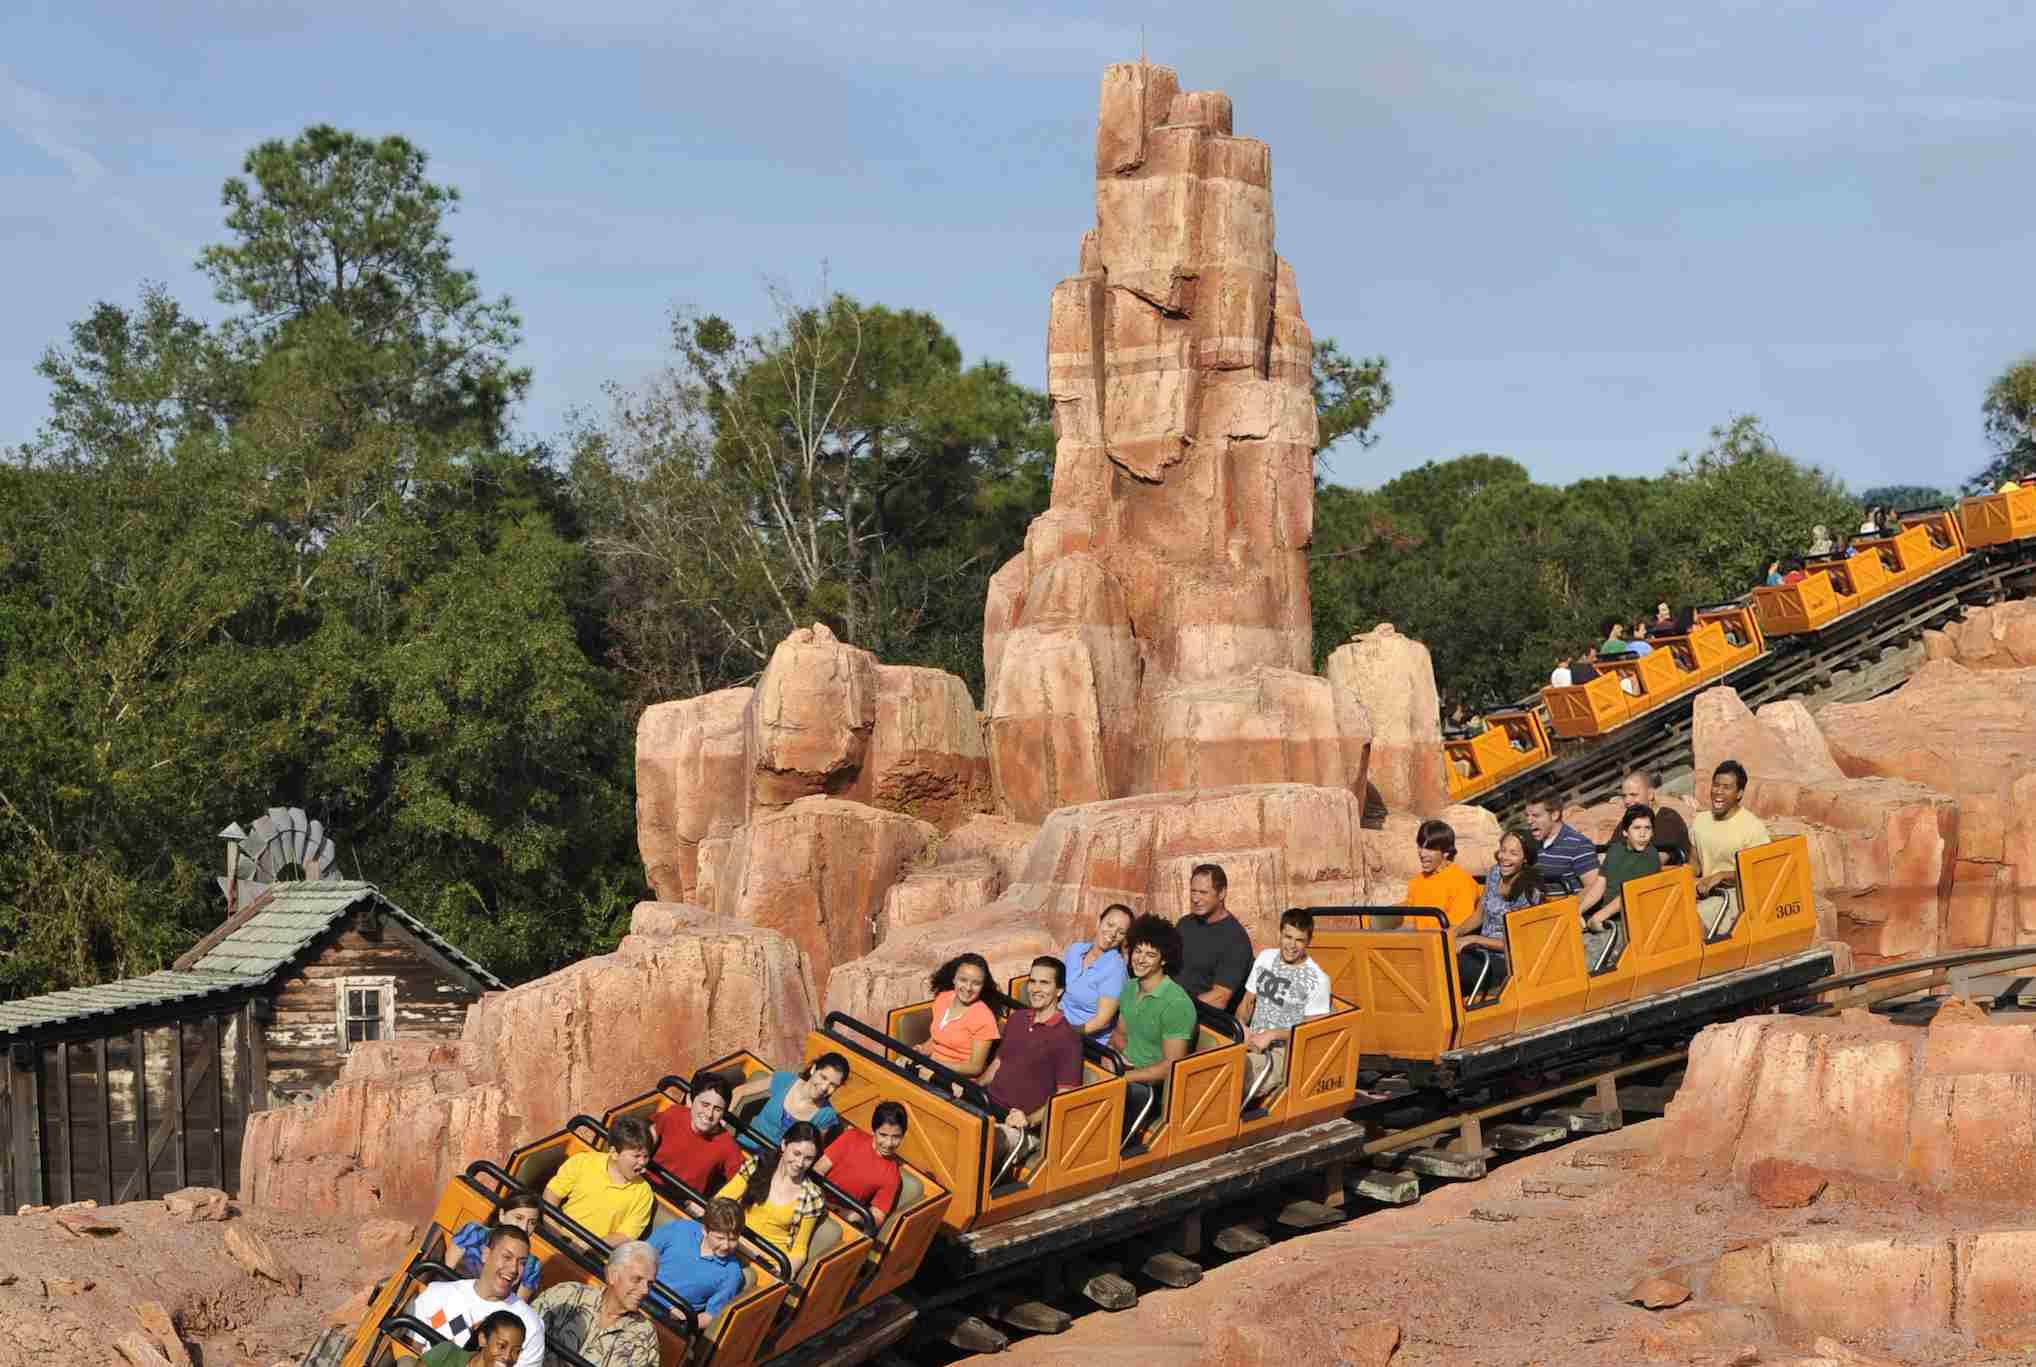 Walt Disney World's Big Thunder Mountain Railroad